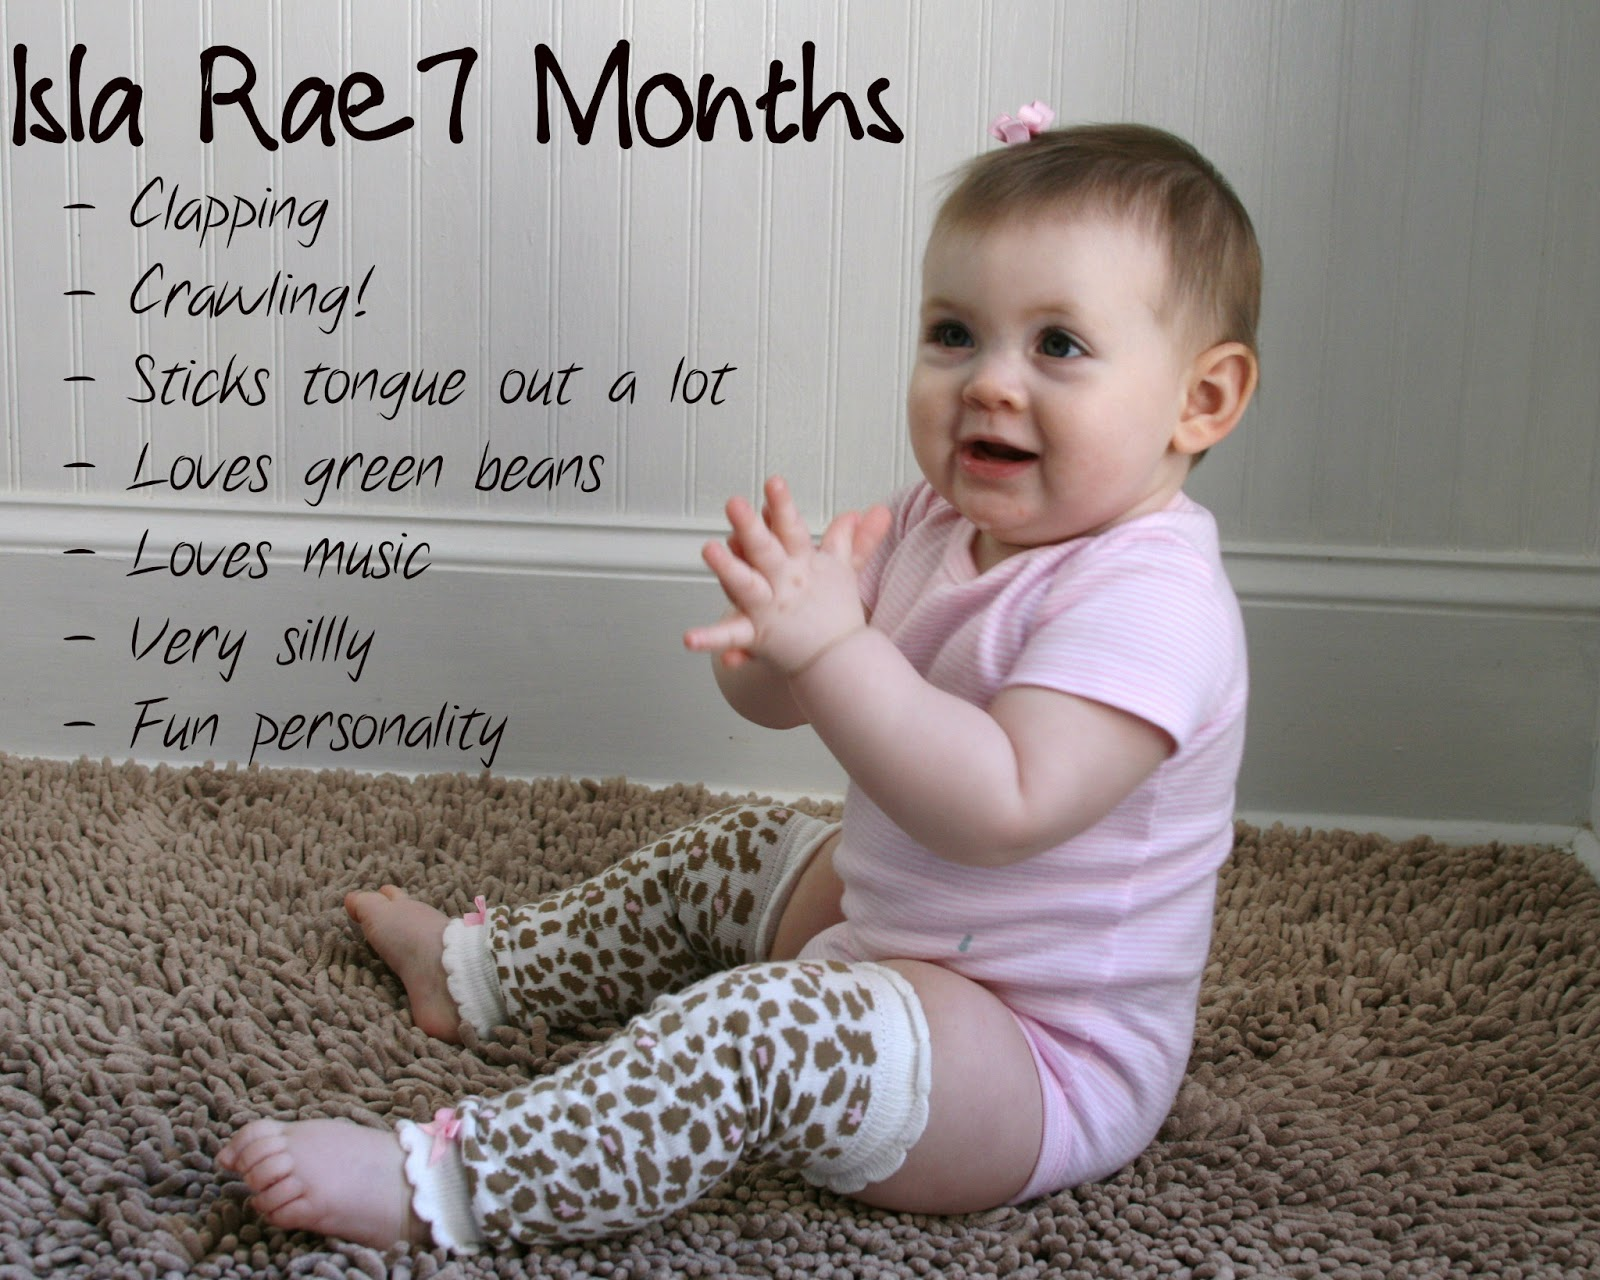 Rock  bye bradbury baby milestones isla months old also month rh cheapairjordans